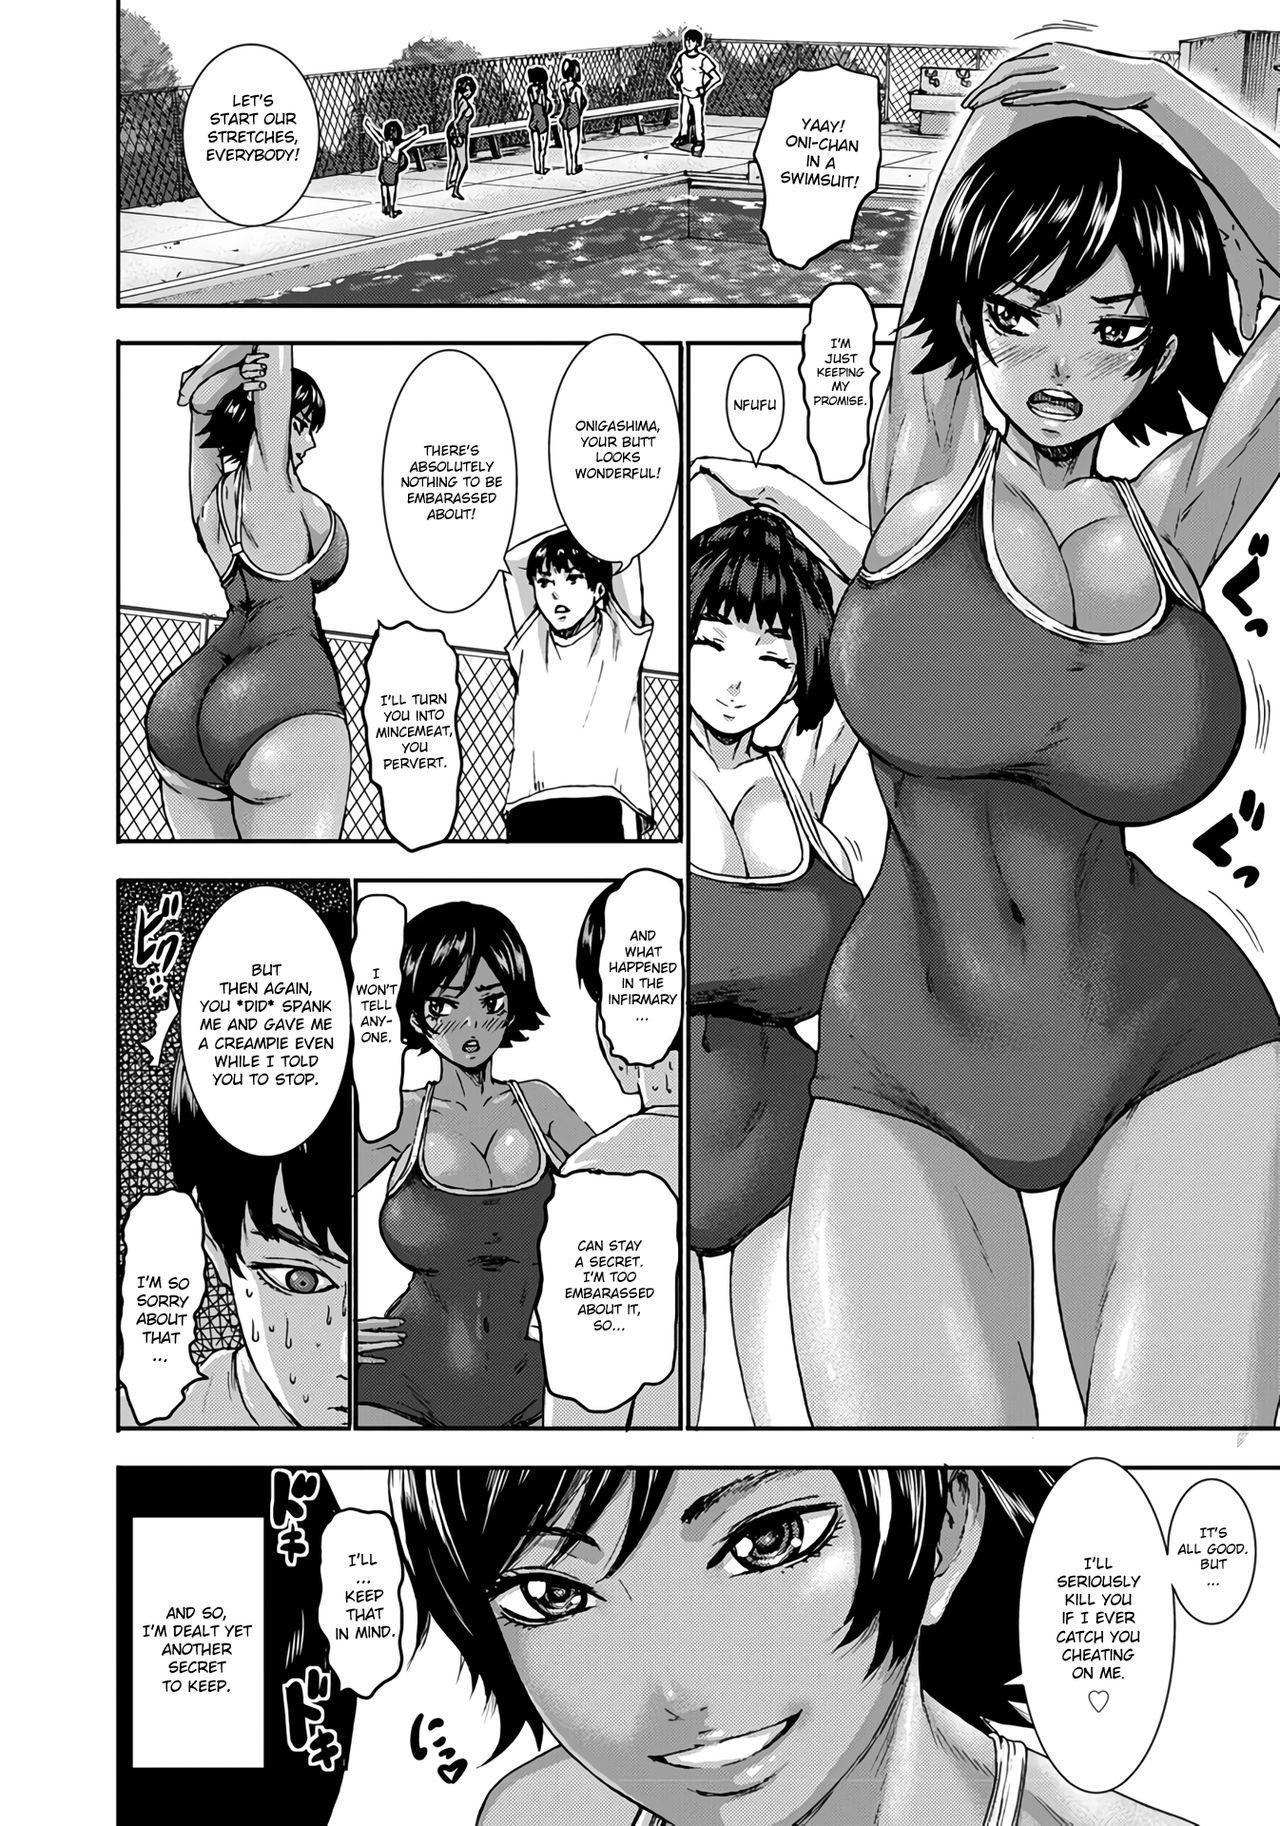 Chounyuu Gakuen   Academy For Huge Breasts Ch. 1-7 47